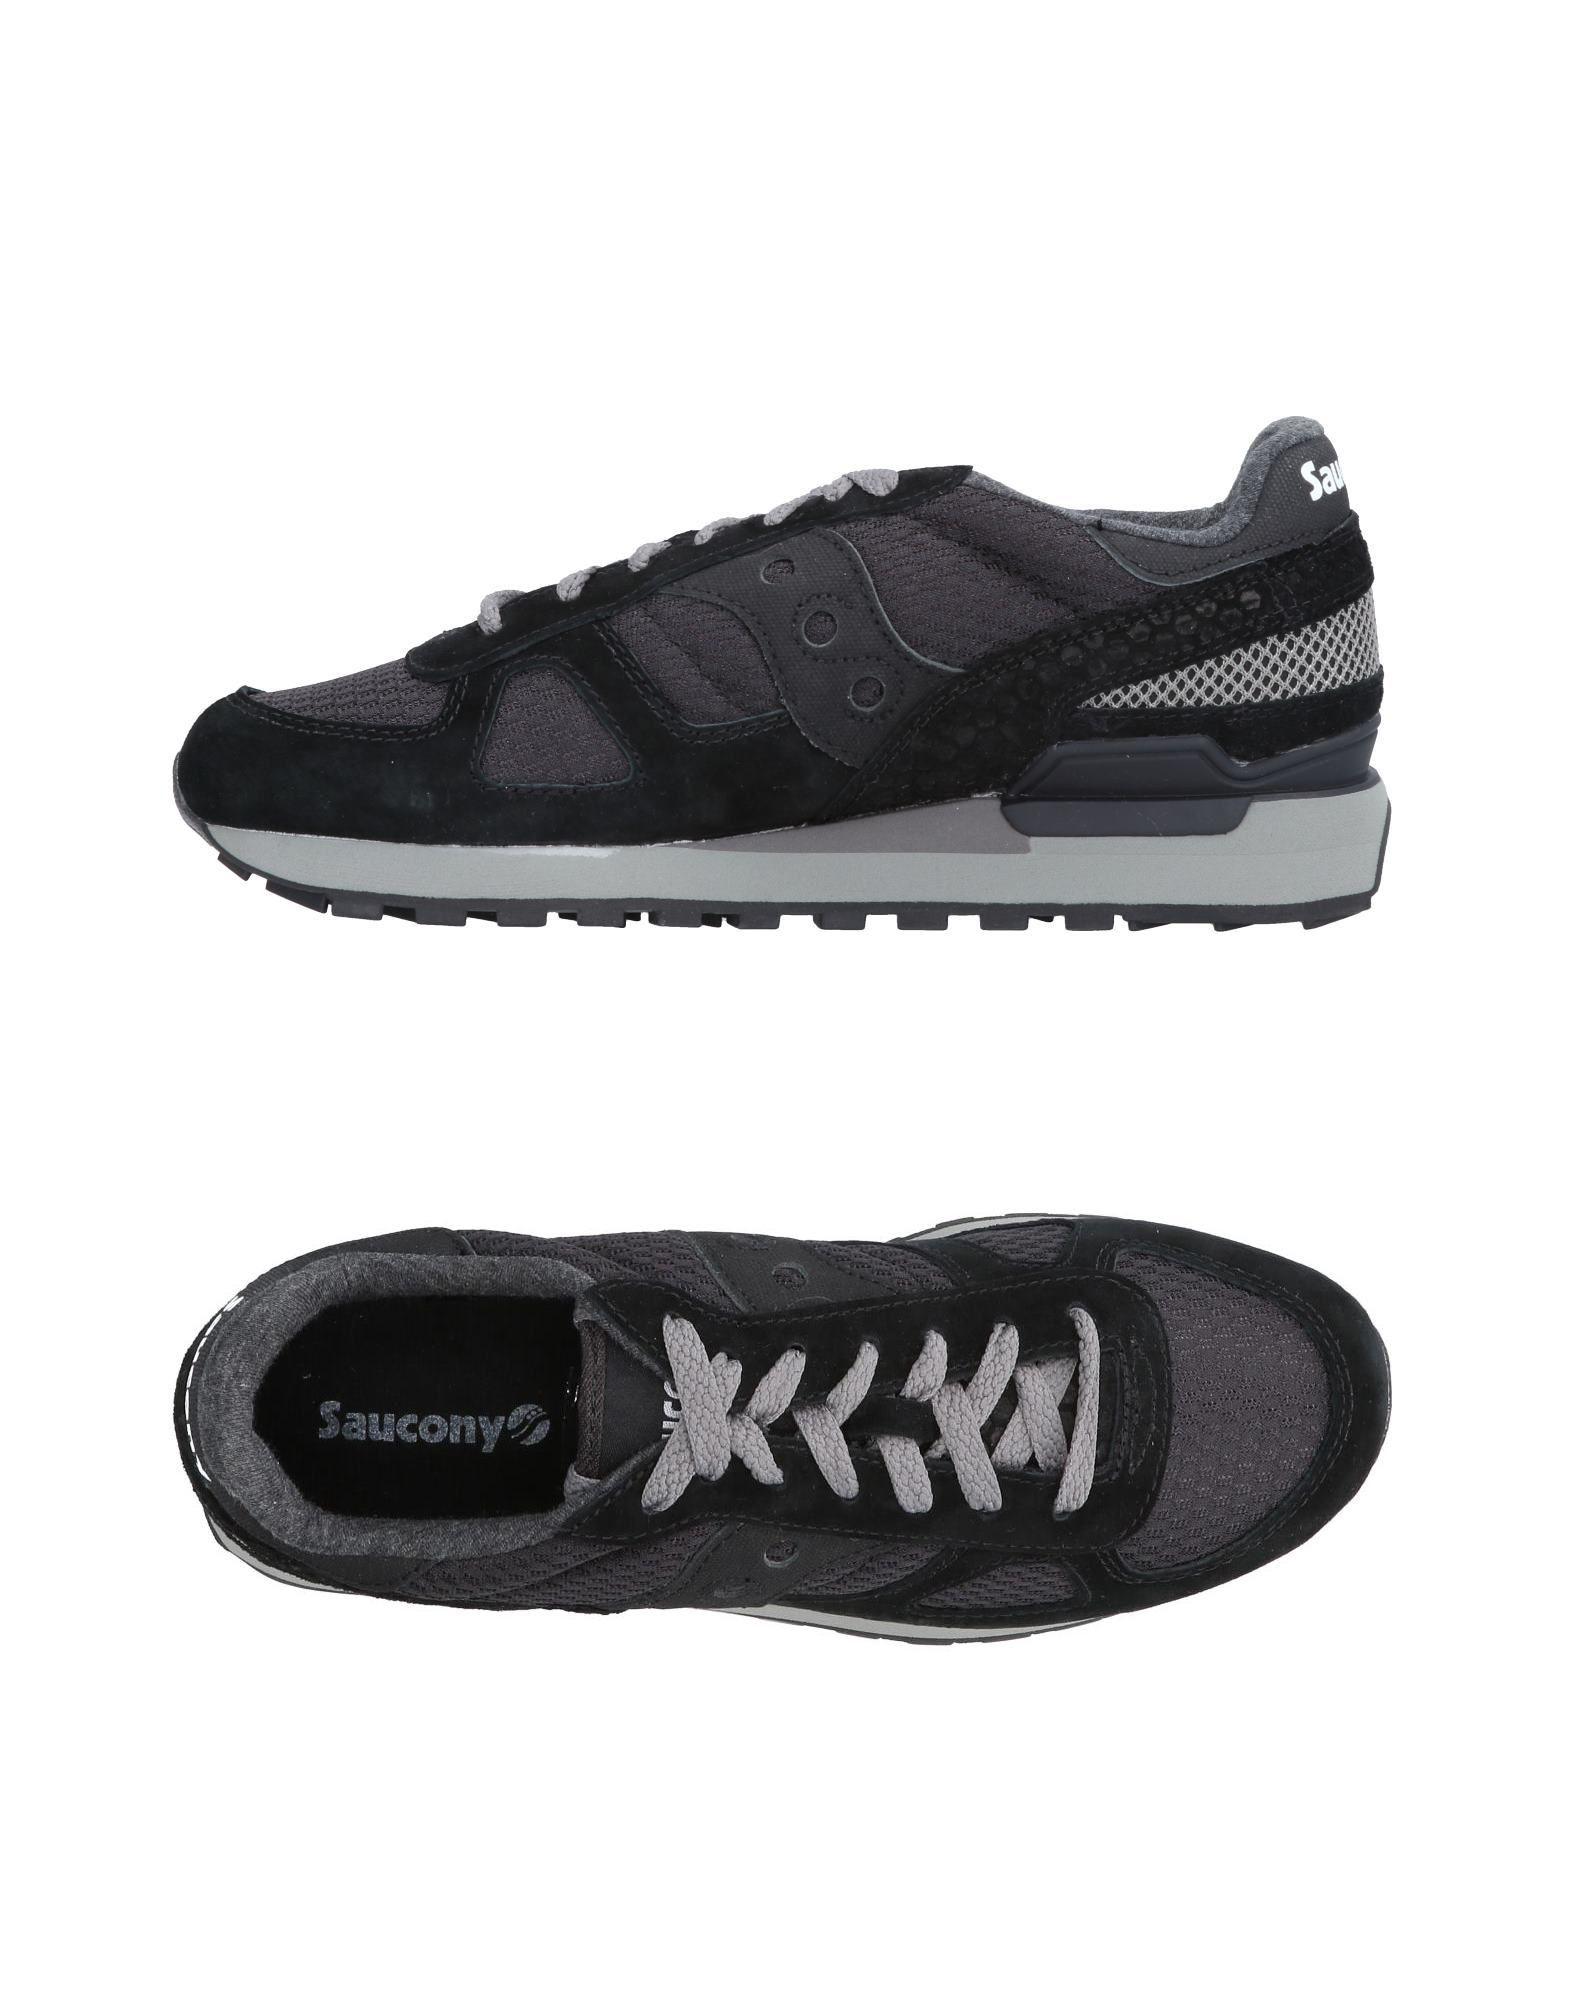 Moda Sneakers Saucony Uomo - 11499614JD